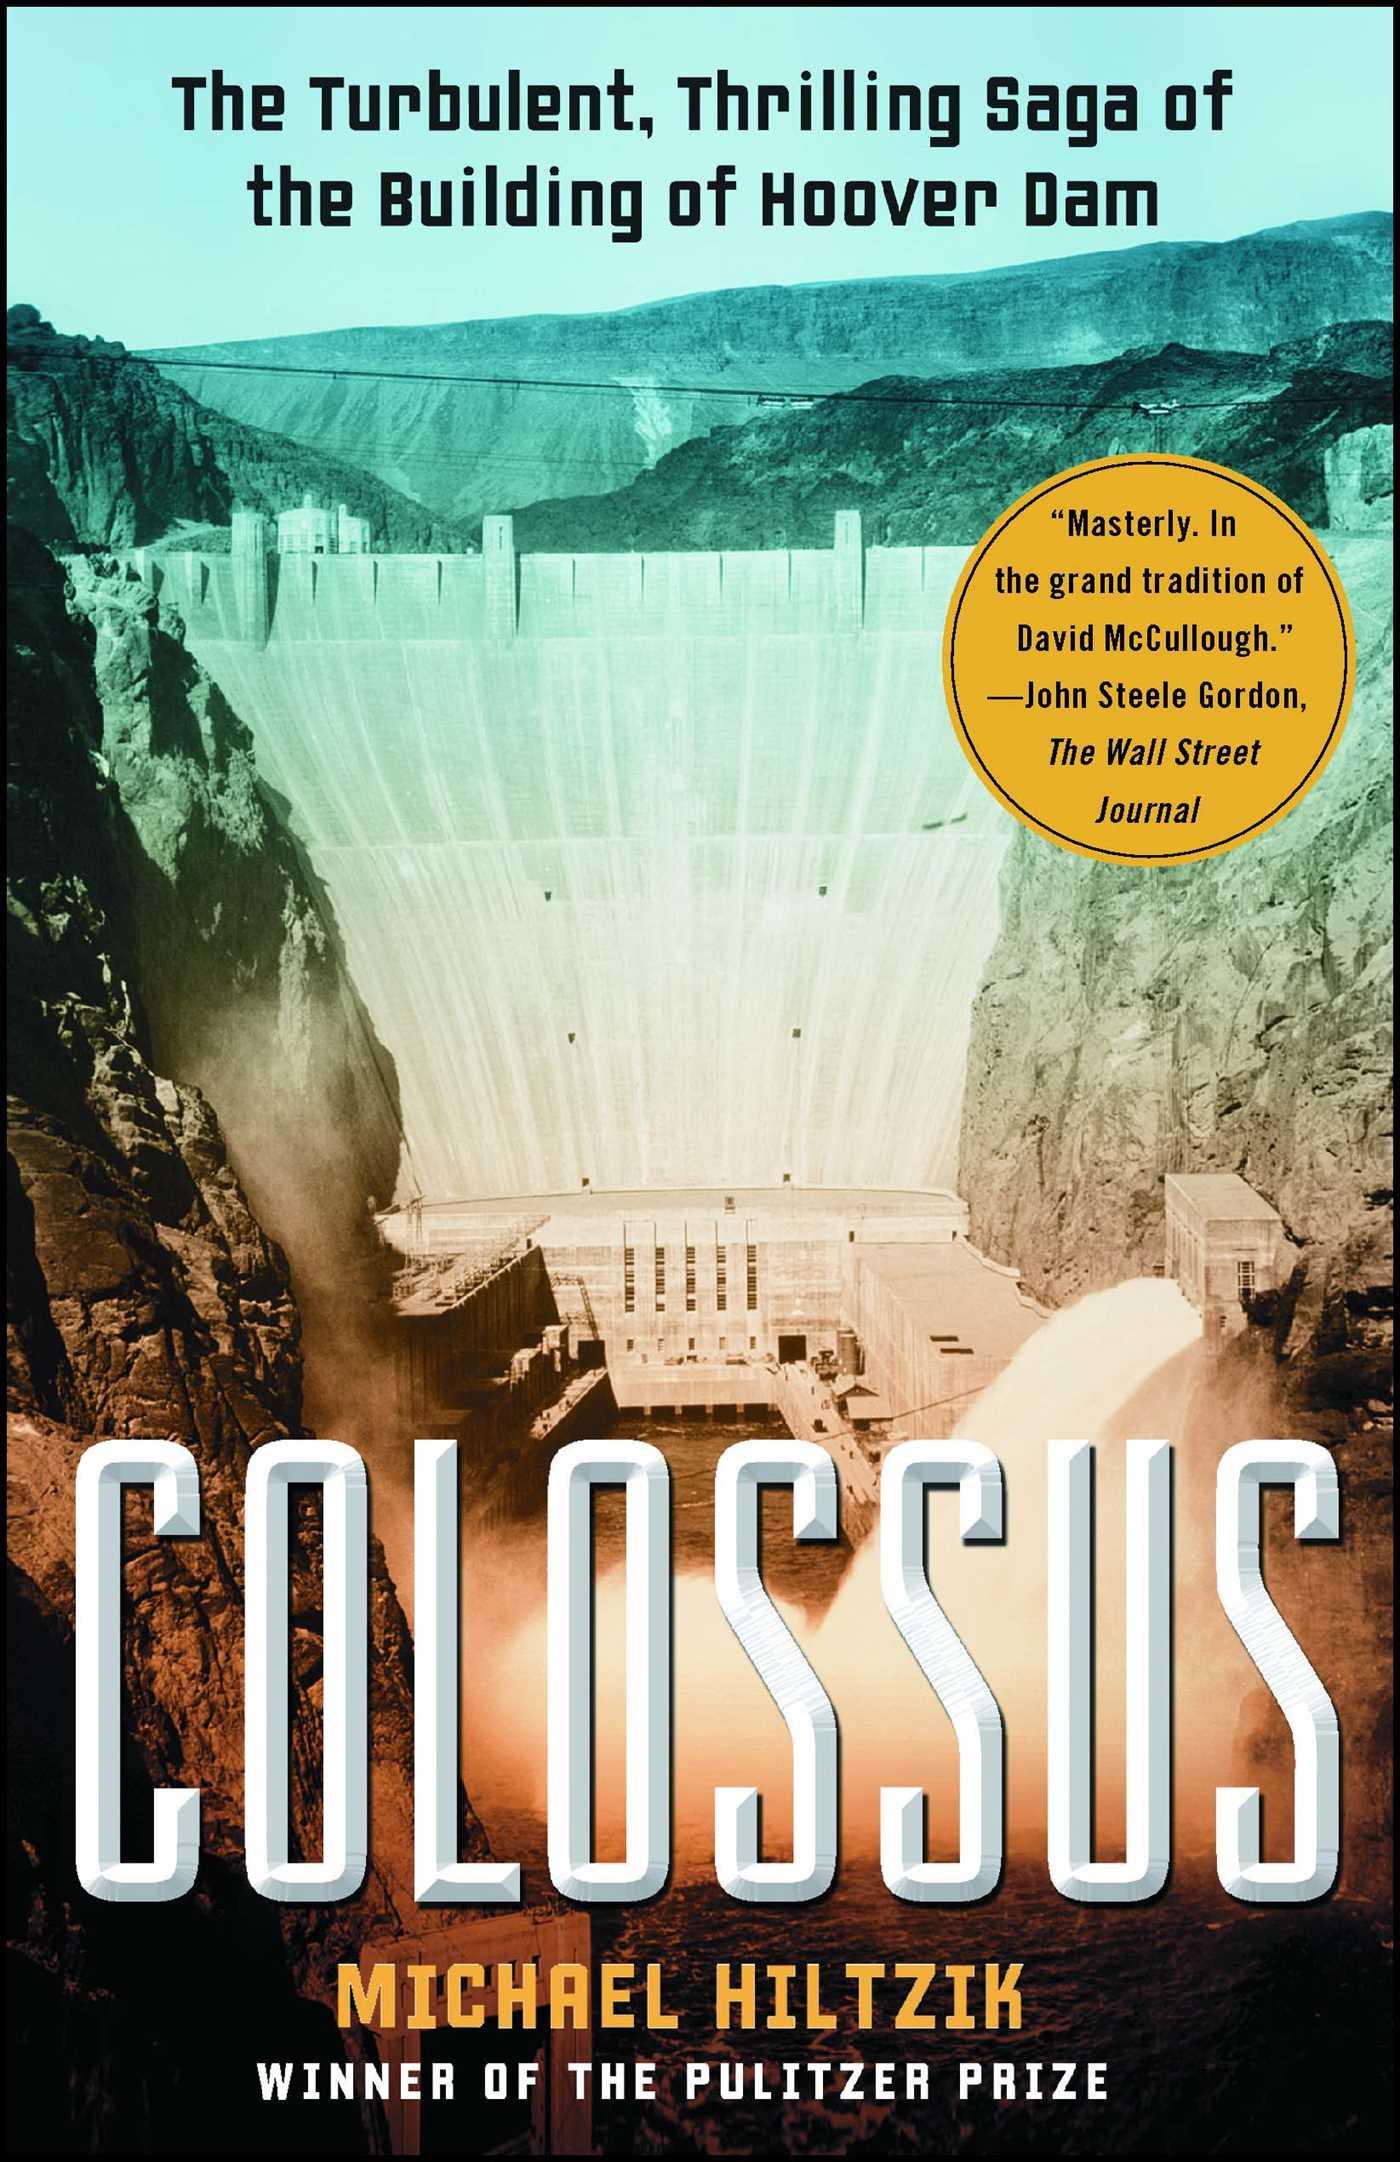 Colossus 9781416532170 hr